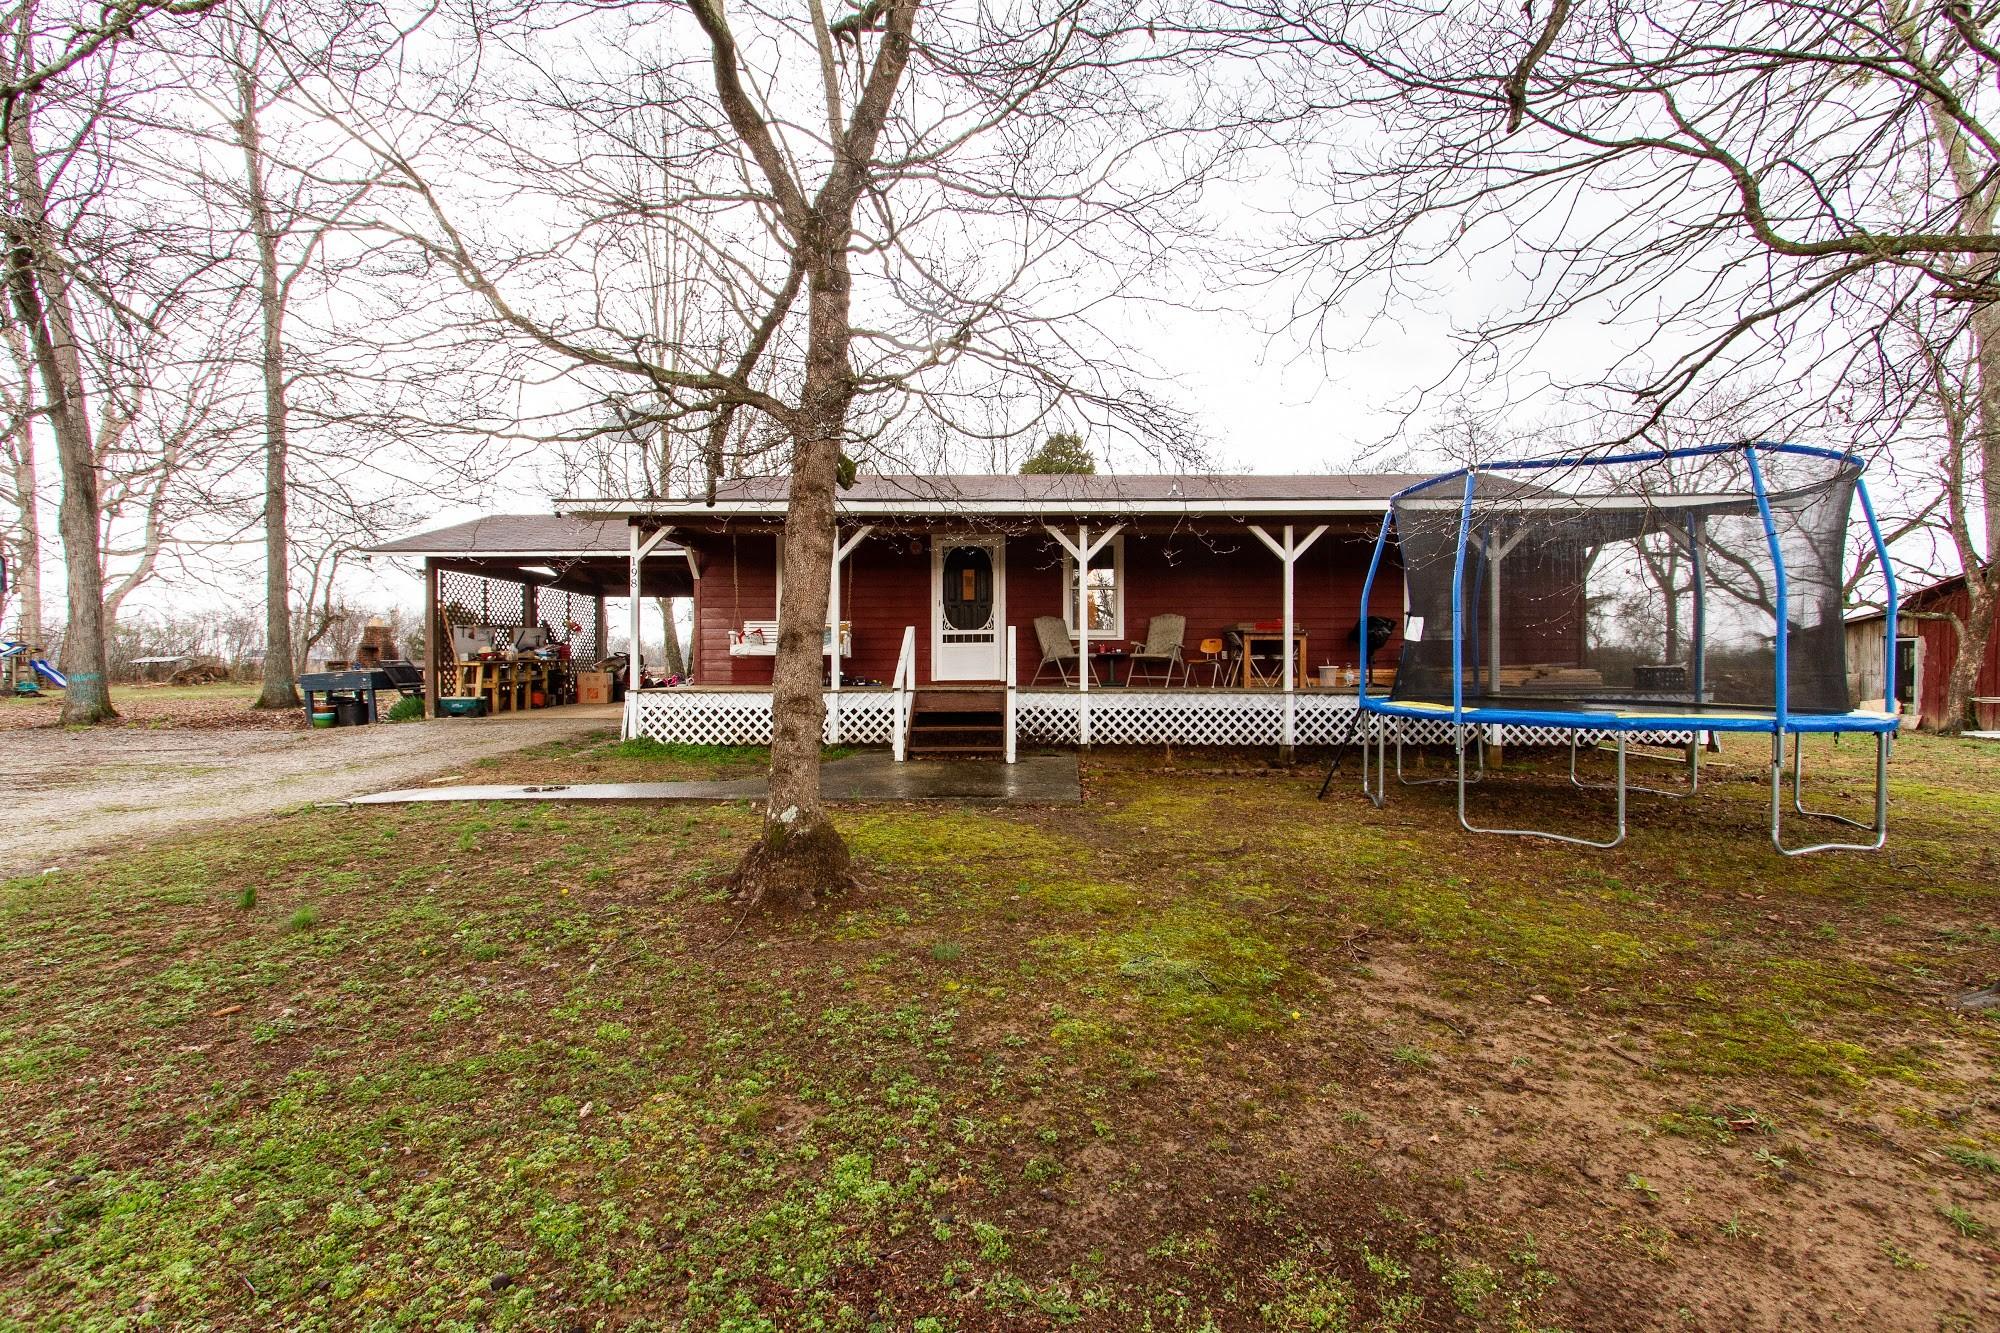 198 Rhoads Ln, Hillsboro, TN 37342 - Hillsboro, TN real estate listing